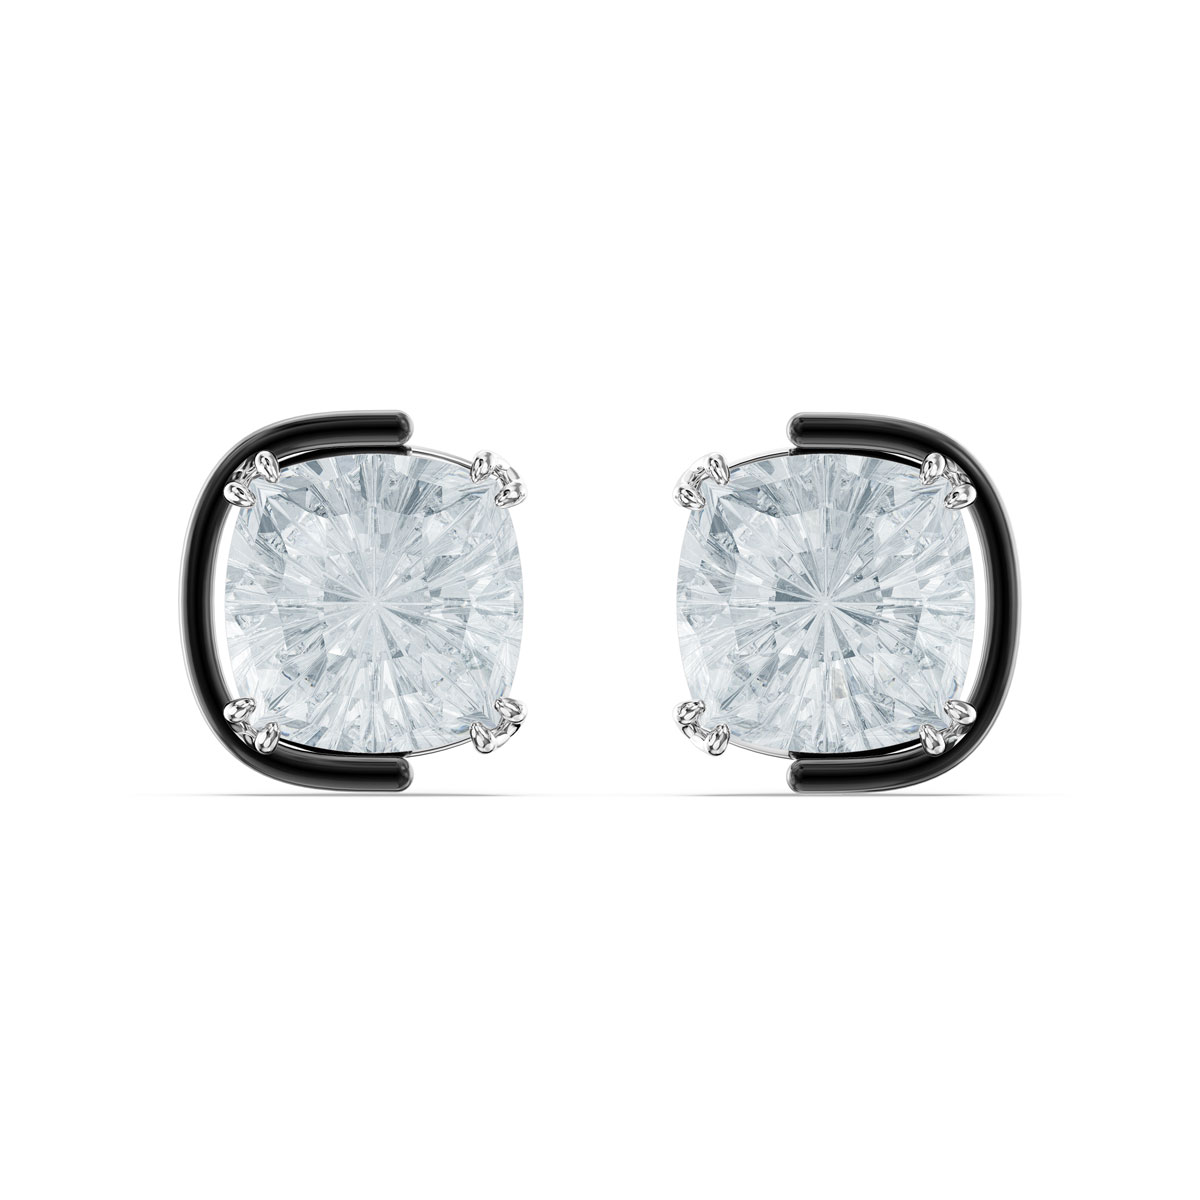 Swarovski Harmonia Earrings, Cushion Cut Crystals, White, Mixed Metal Finish, Pair